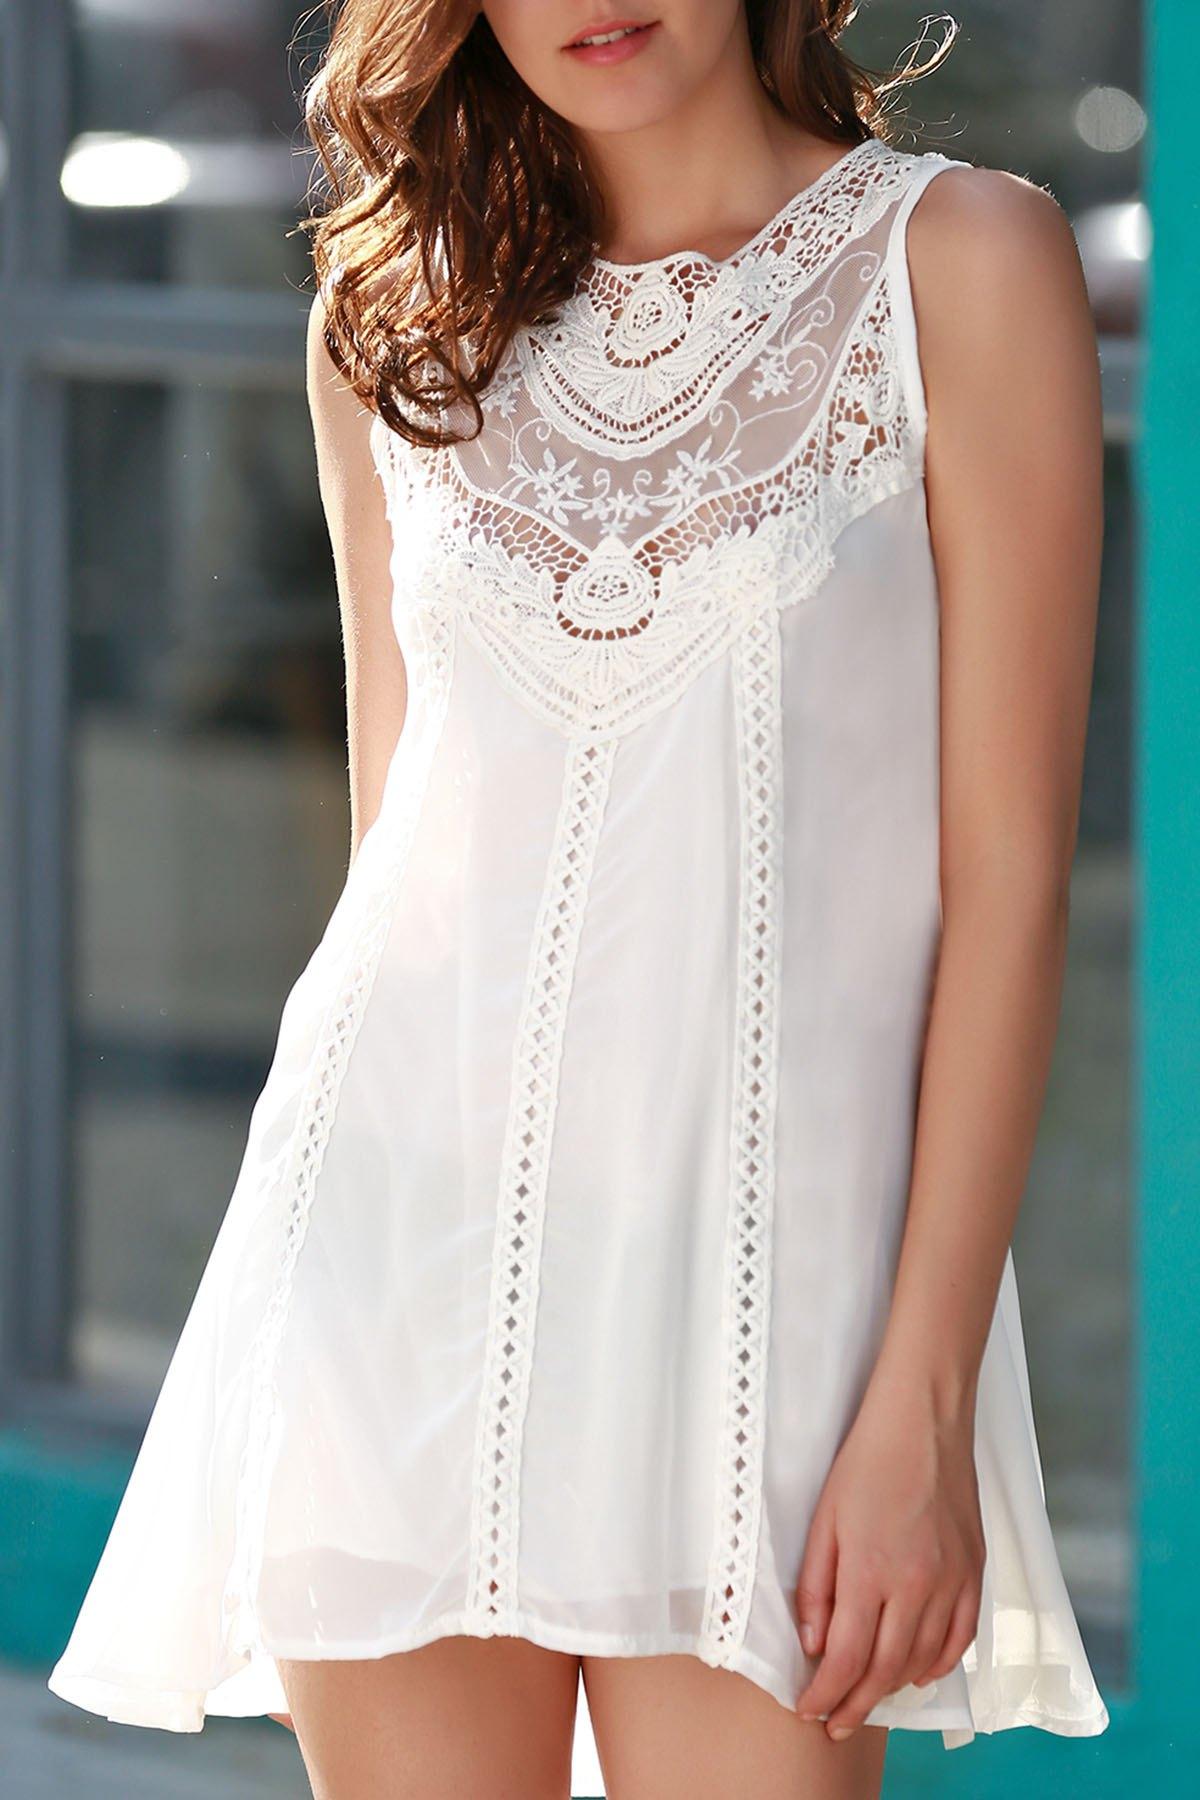 Spliced Openwork White Chiffon Dress - WHITE S